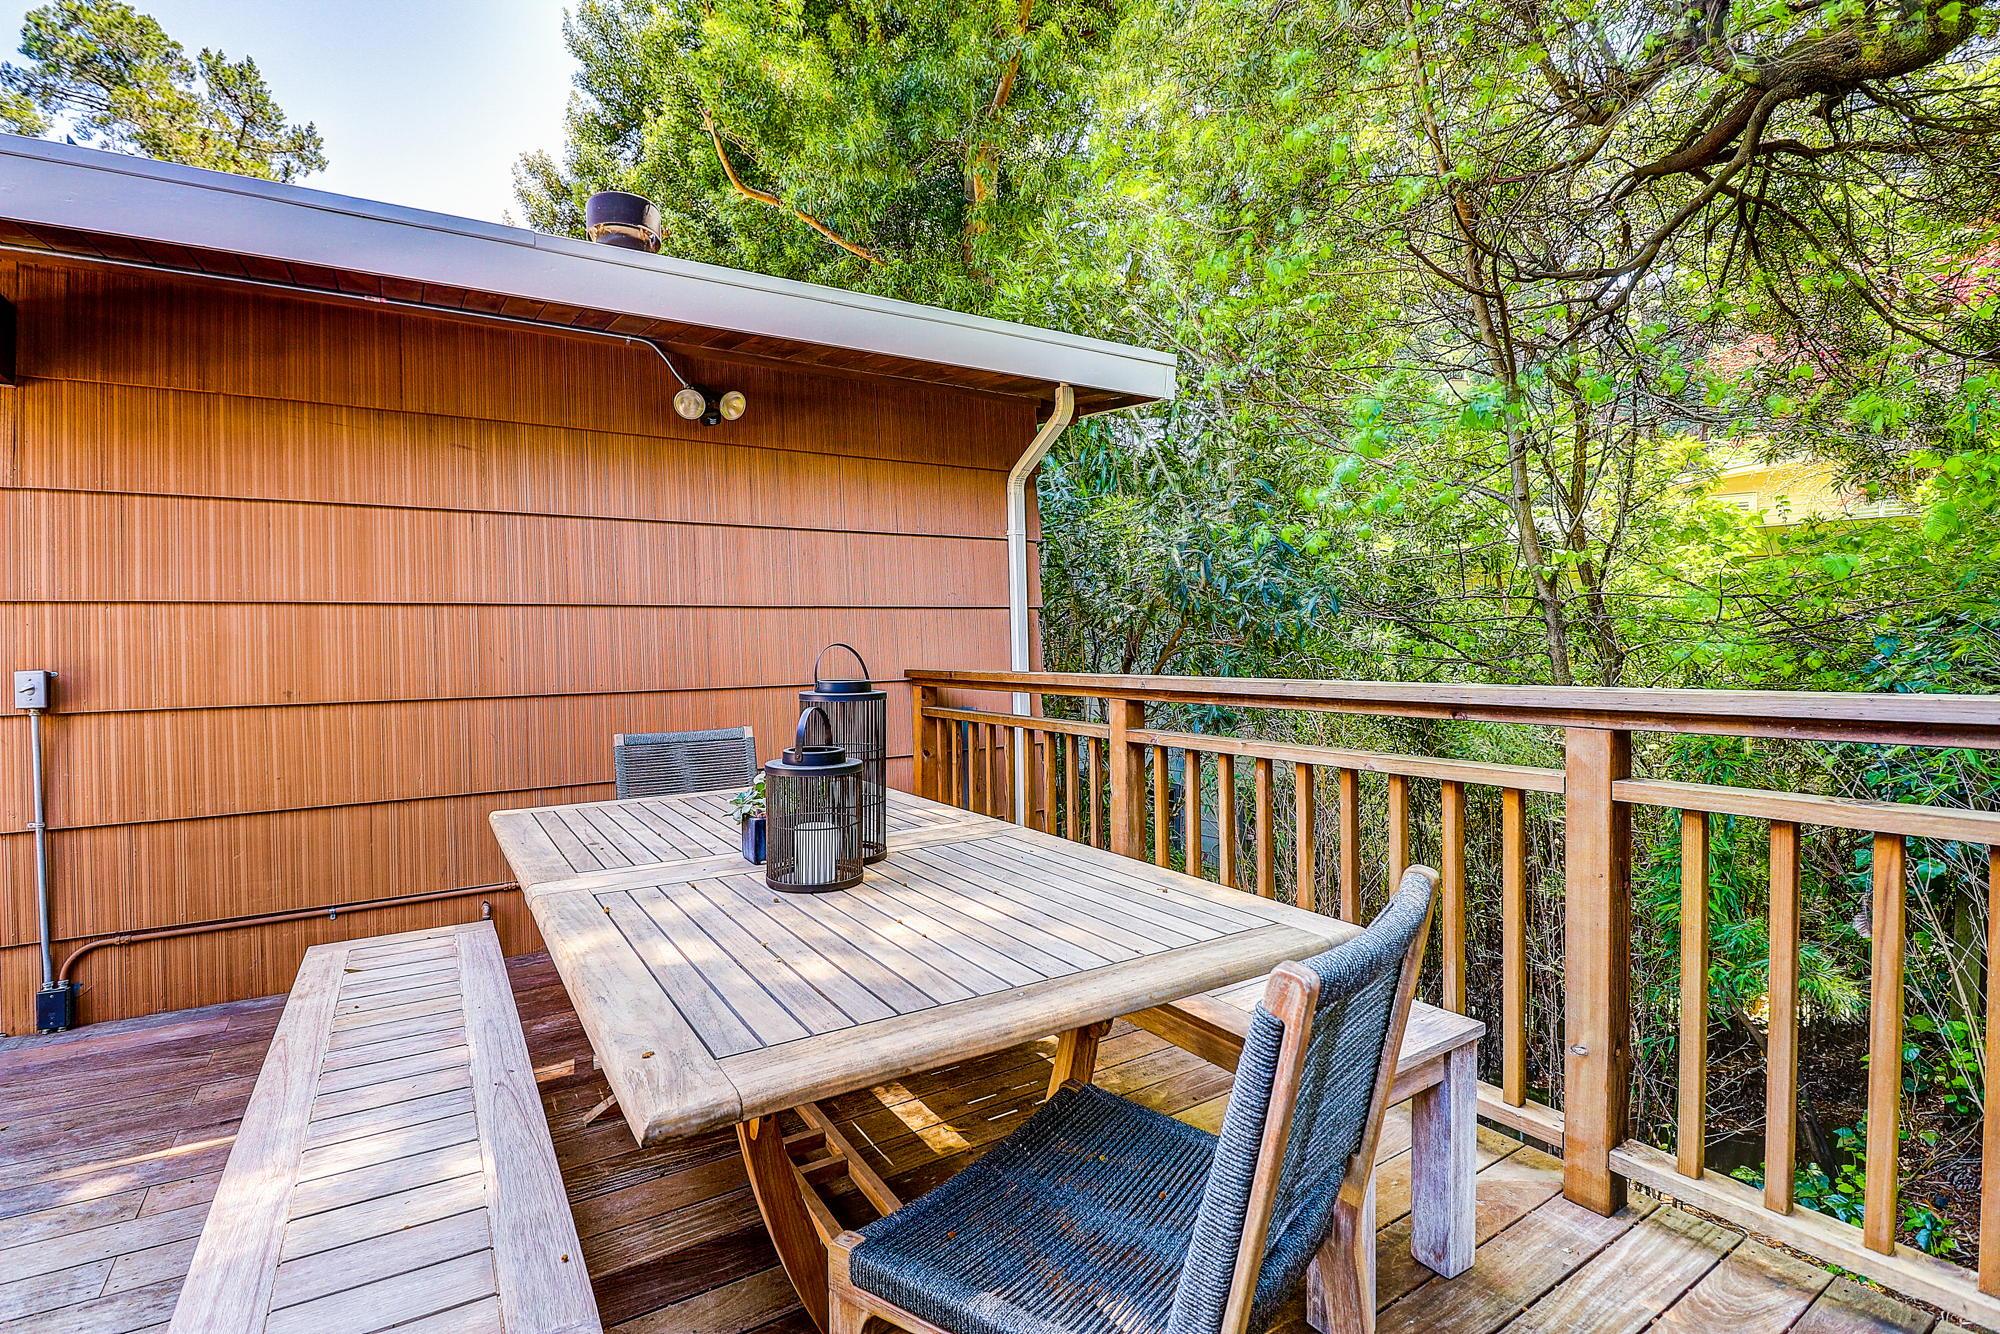 360 Corte Madera Avenue,  Marin County Top Realtor -19- Own Marin at Compass.jpg